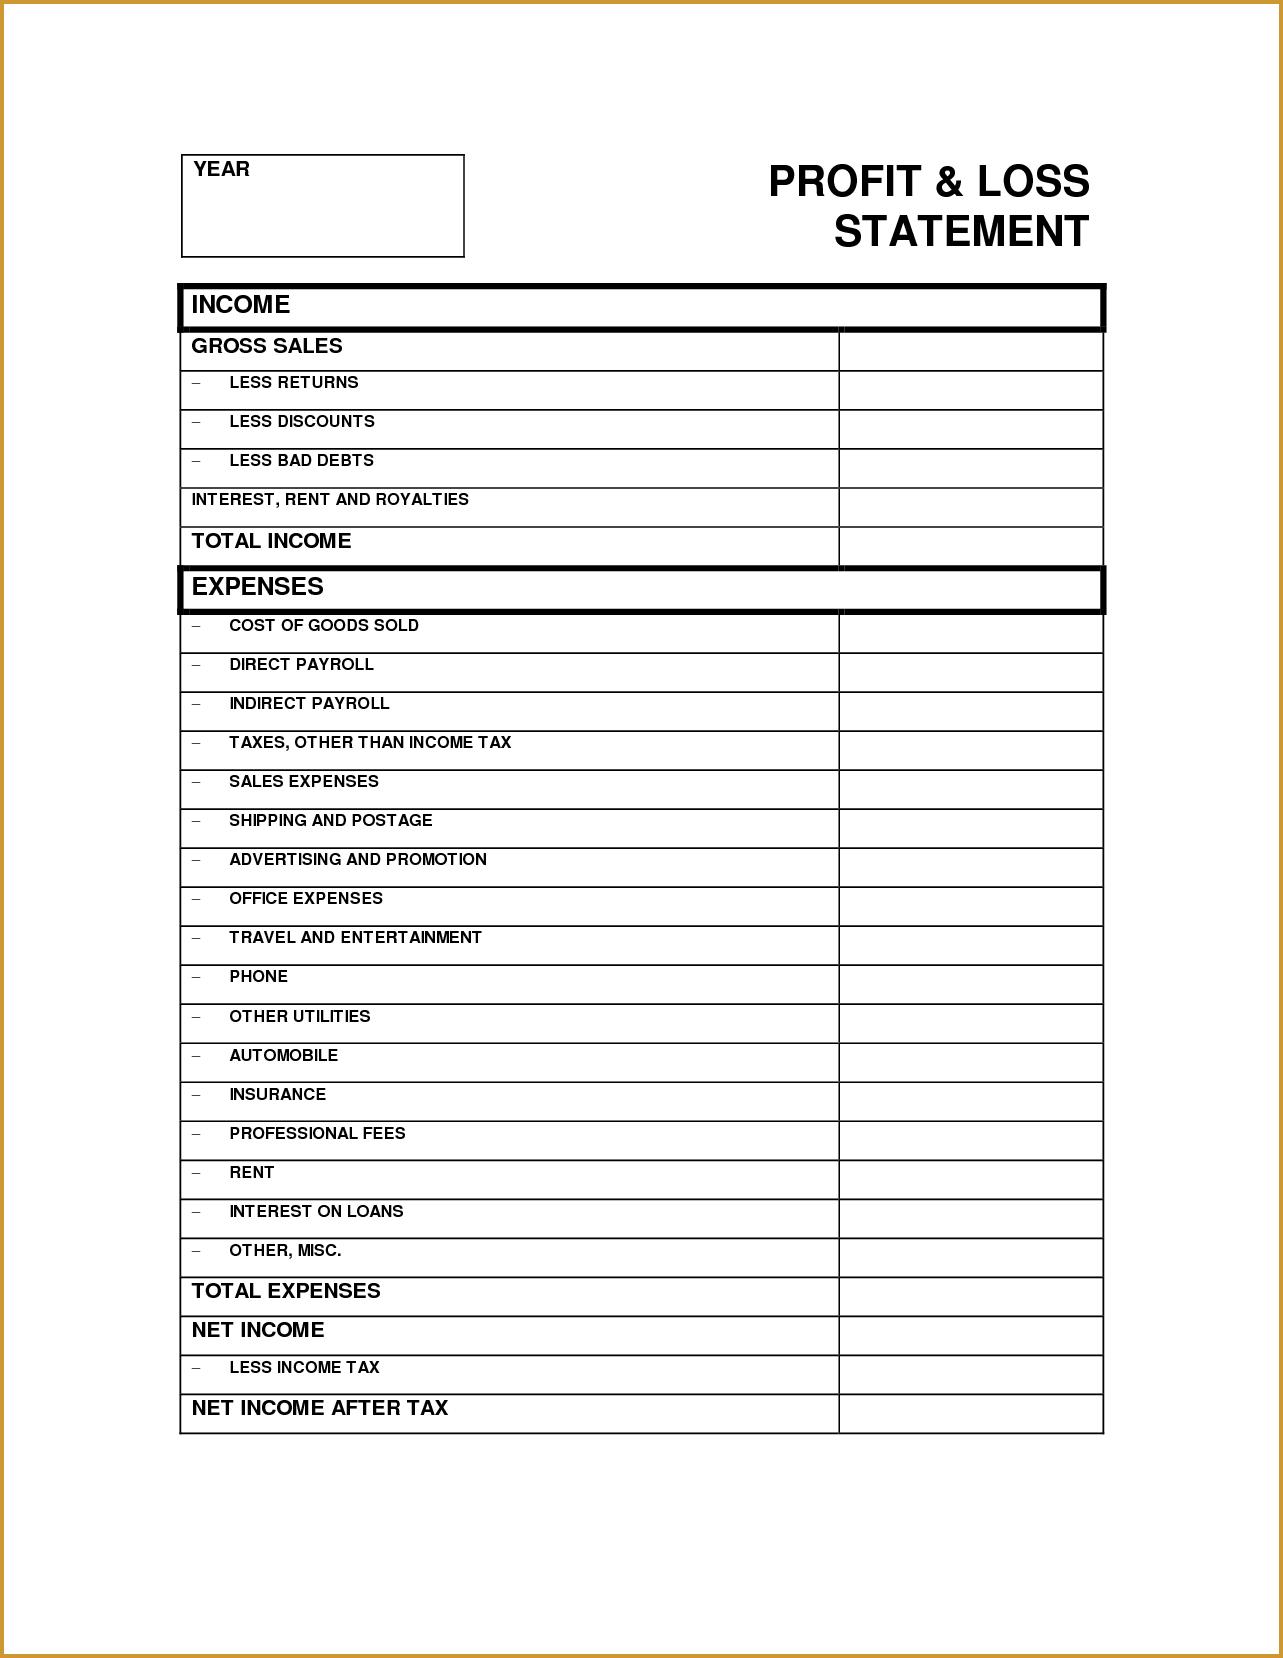 Profit Loss Statement Form 532372.png (1283×1658)